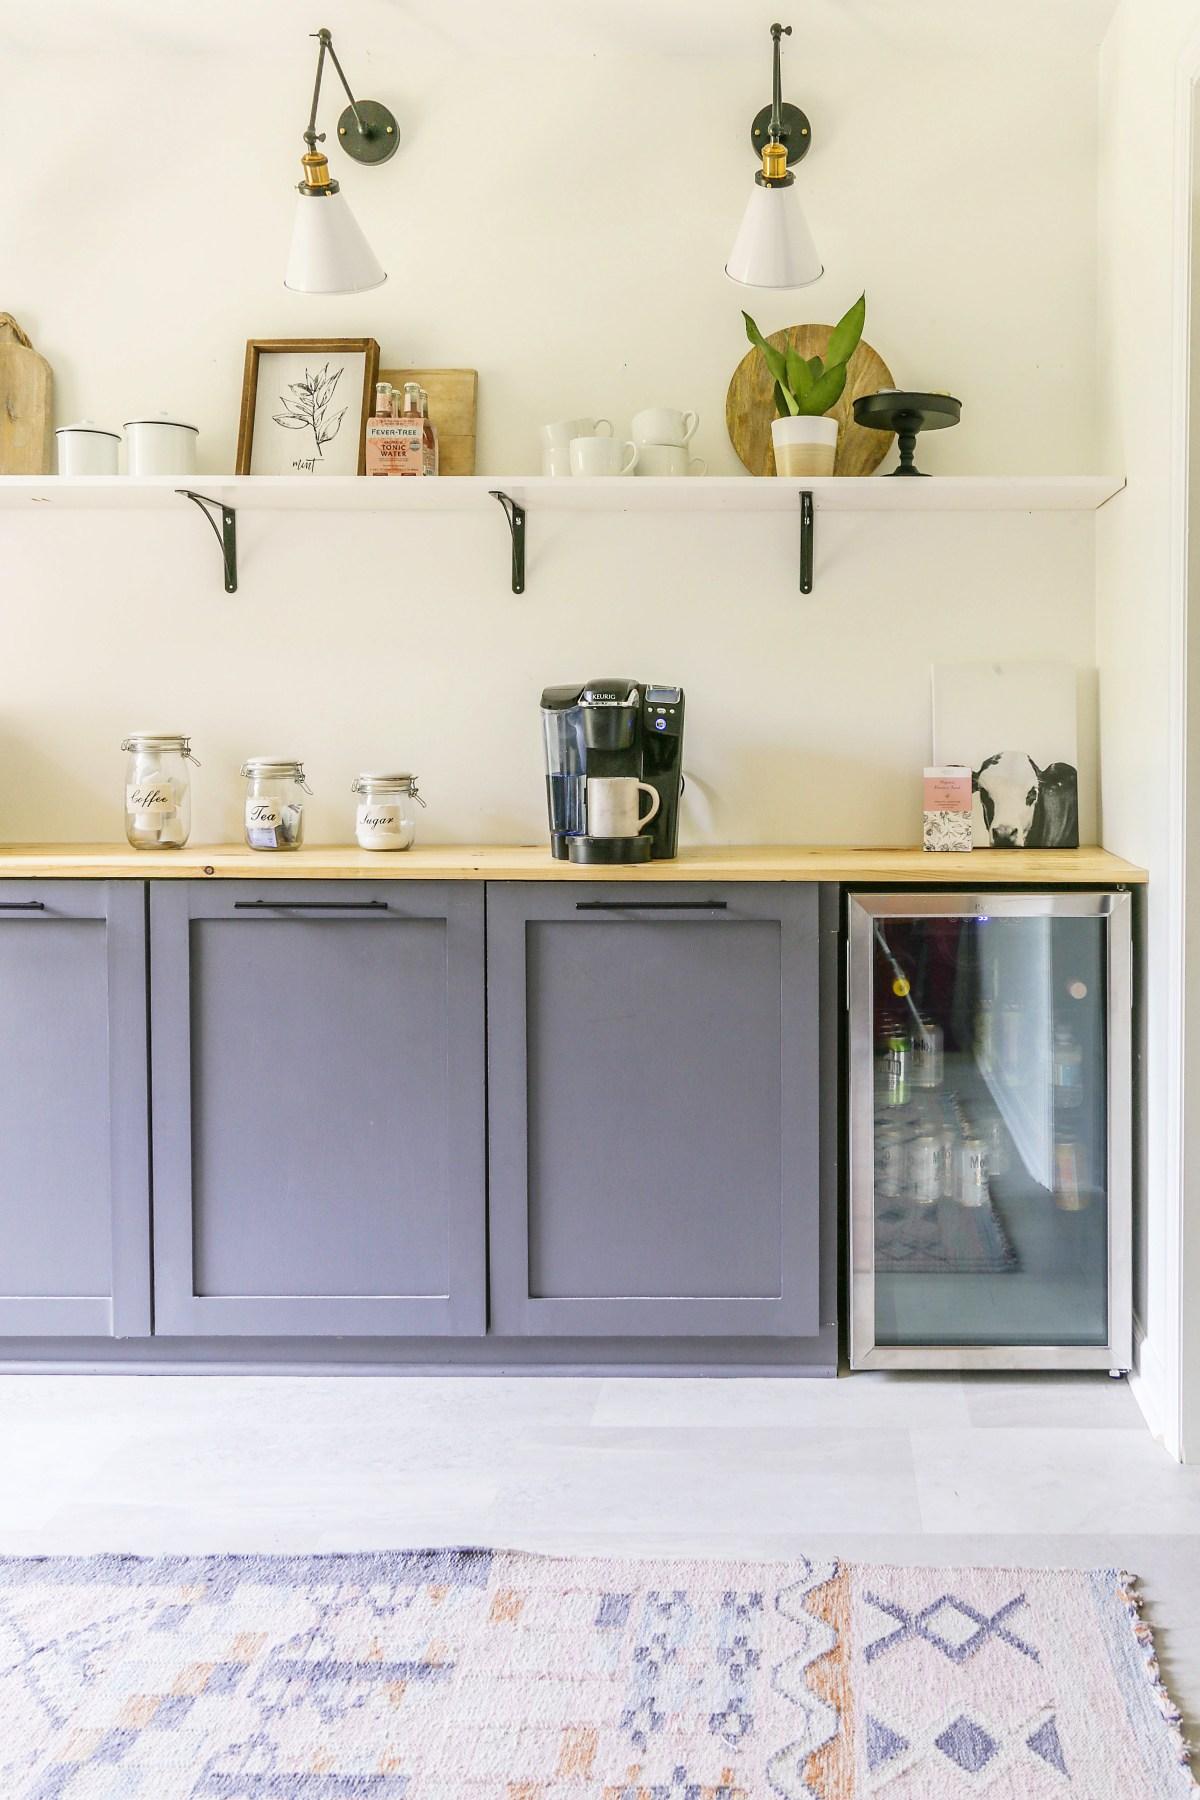 Diy Butler Pantry Reveal With Modern Farmhouse Coffee Bar Build